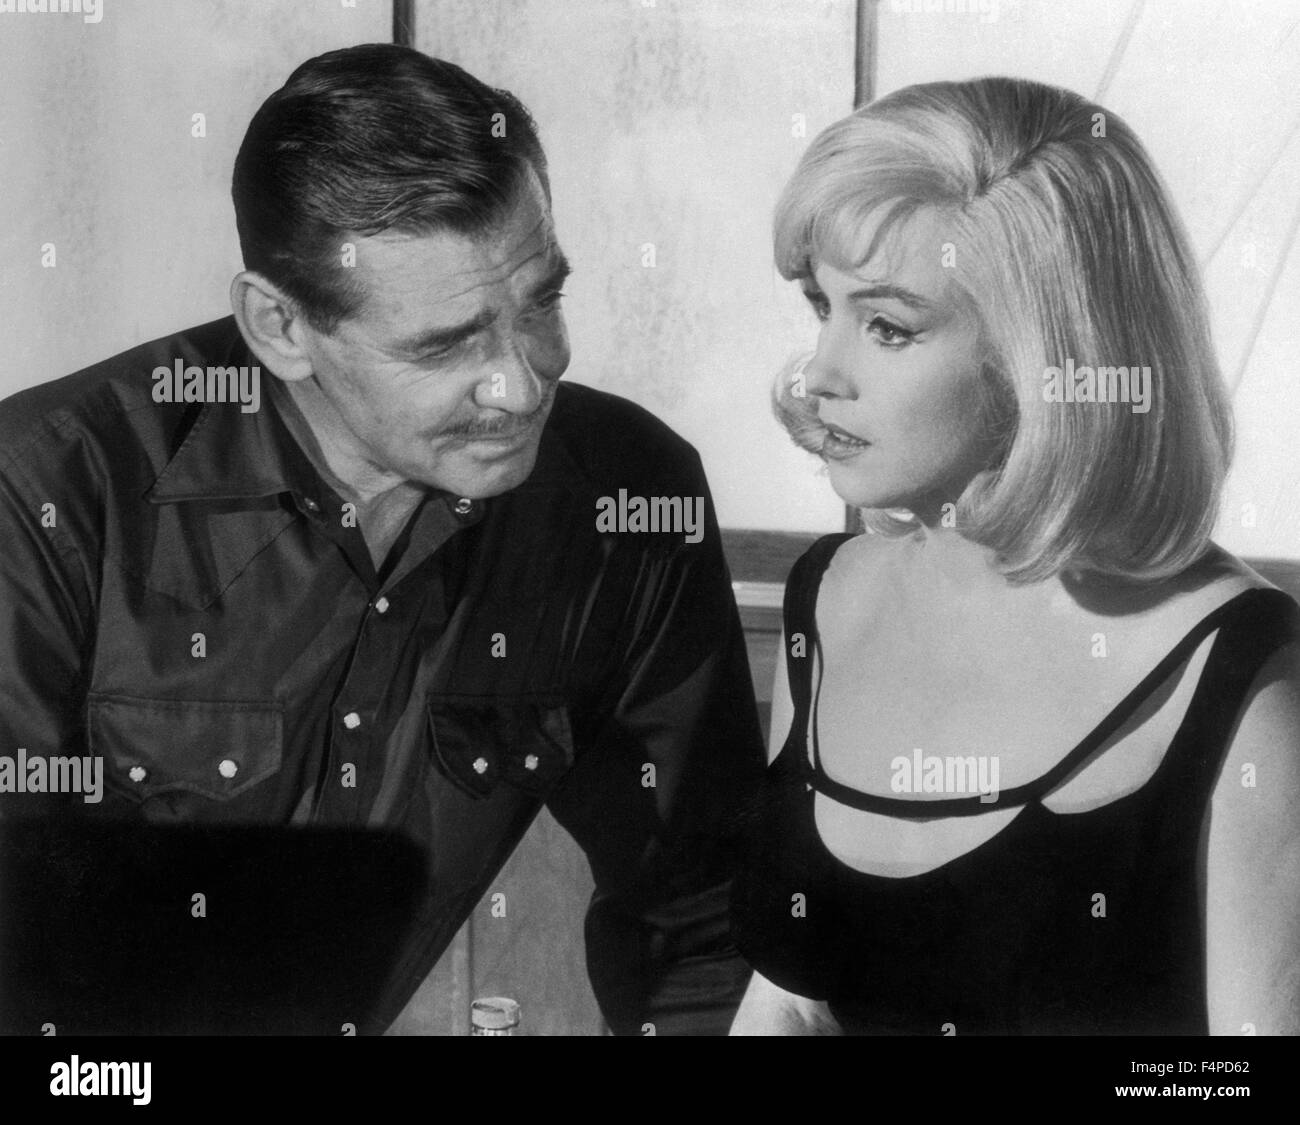 Clark Gable, Marilyn Monroe / The Misfits 1961 directed by John Huston - Stock Image